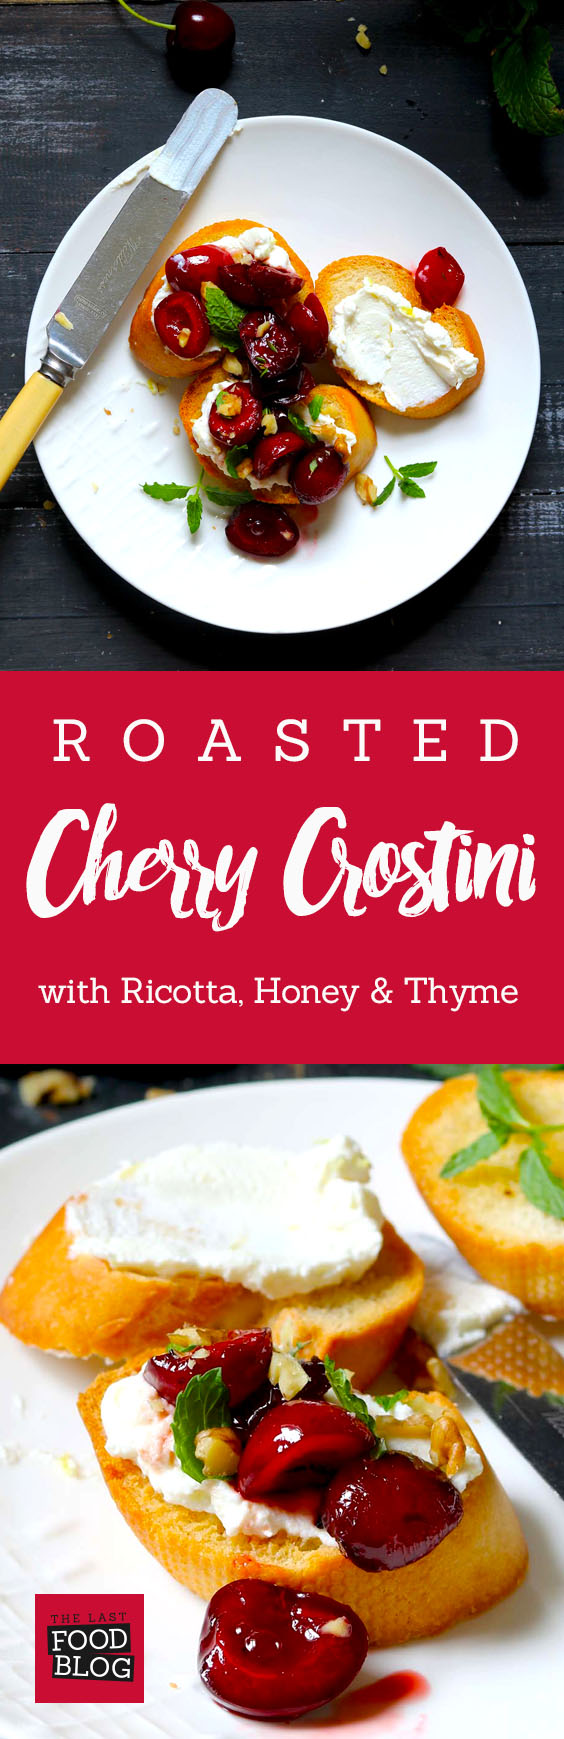 Roasted Cherry Crostini with Ricotta - thelastfoodblog.com